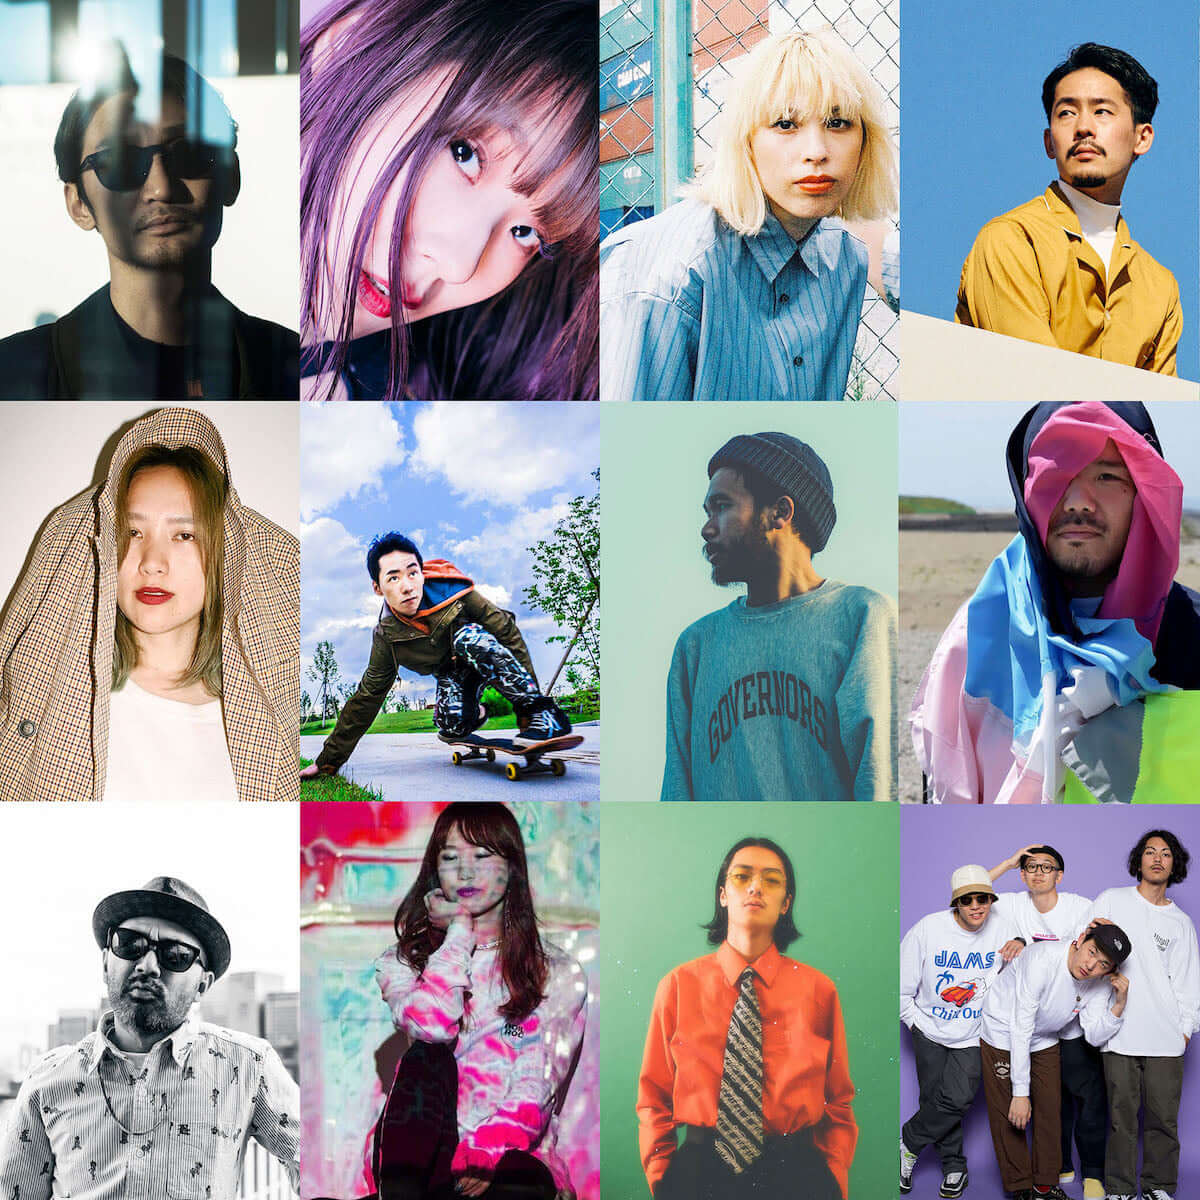 mabanua、HUNGERとコラボしたMVが解禁|TOKYO HEALTH CLUBのTSUBAME、1stアルバム『THE PRESENT』本日リリース music190417_tsubame_2-1200x1200